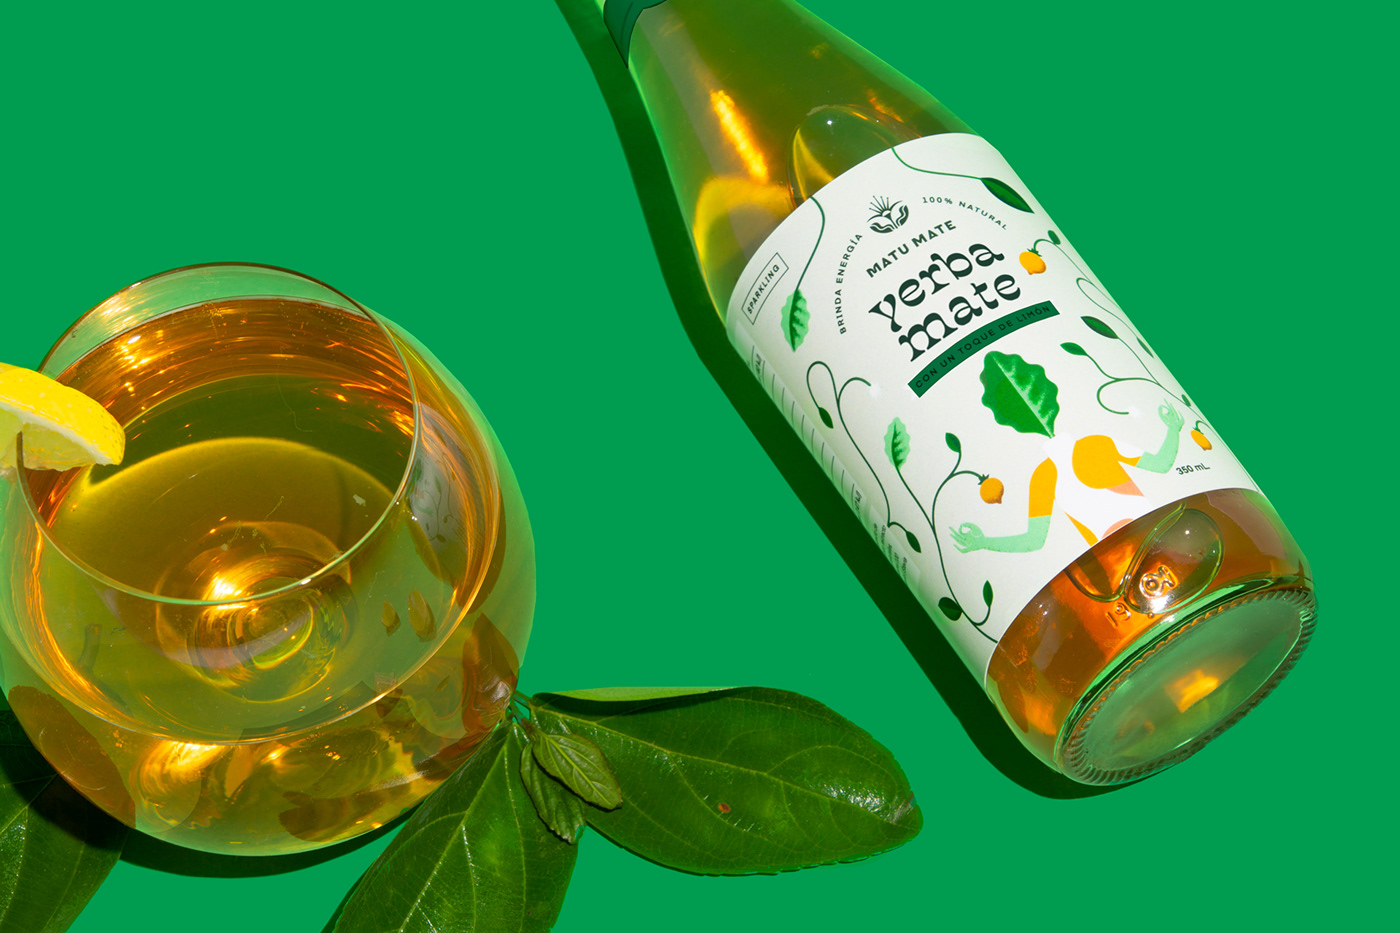 beverage,branding ,Character design ,energy drink,glass bottle,ILLUSTRATION ,logo,natural,Packaging,yerba mate